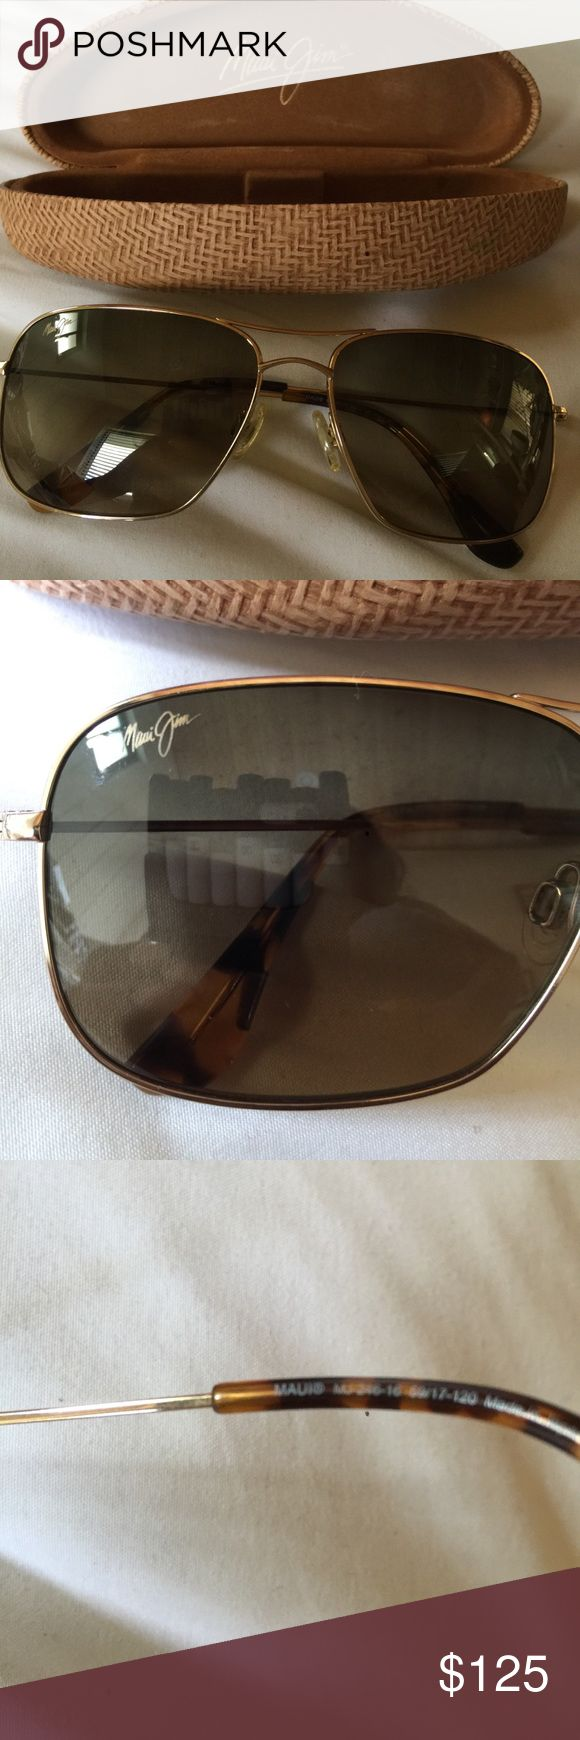 Maui Jim sunglasses, like new with case Maui Jim sunglasses, like new with case Maui Jim Accessories Sunglasses